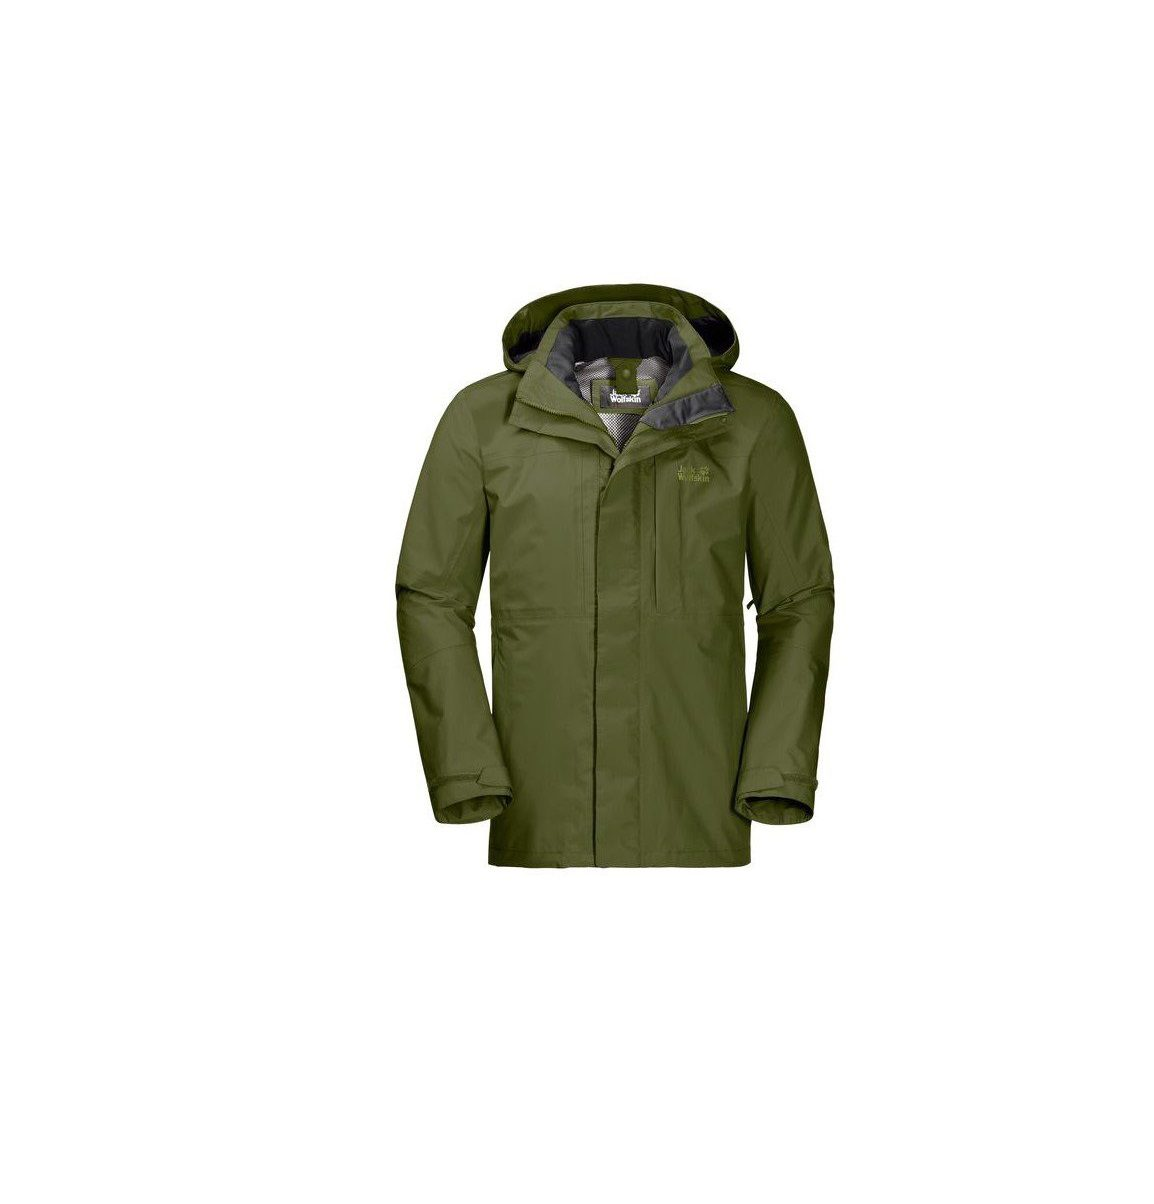 Jack Wolfskin Mens Echo Peak Flex Jacket Cypress Green